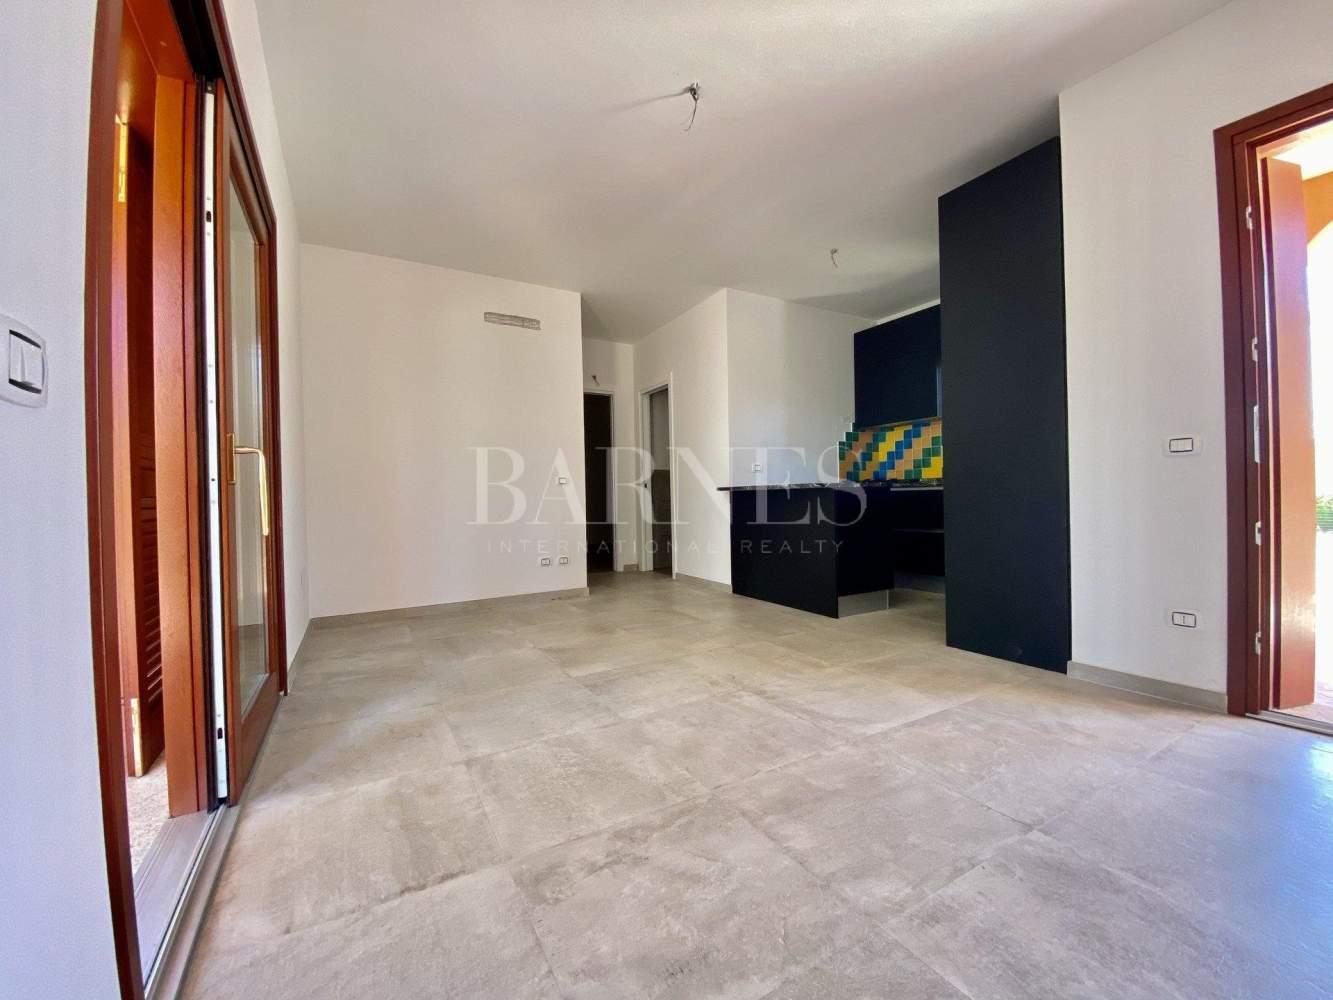 San Teodoro  - Maison 3 Pièces 2 Chambres - picture 6